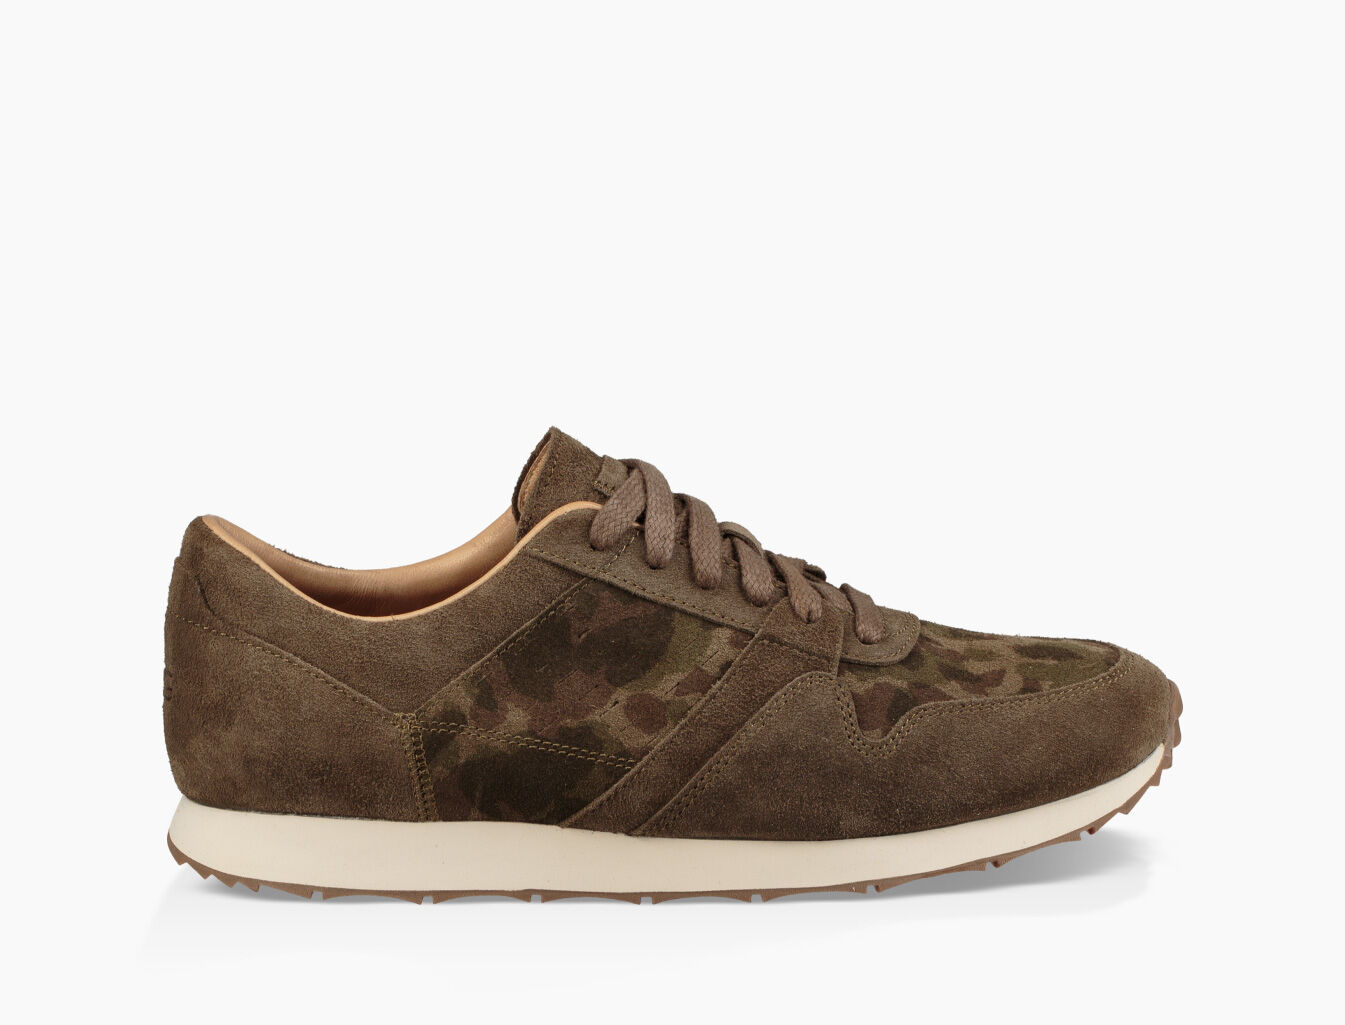 UGG Sneaker TRIGO suede Logo camouflage khaki tNMHB0